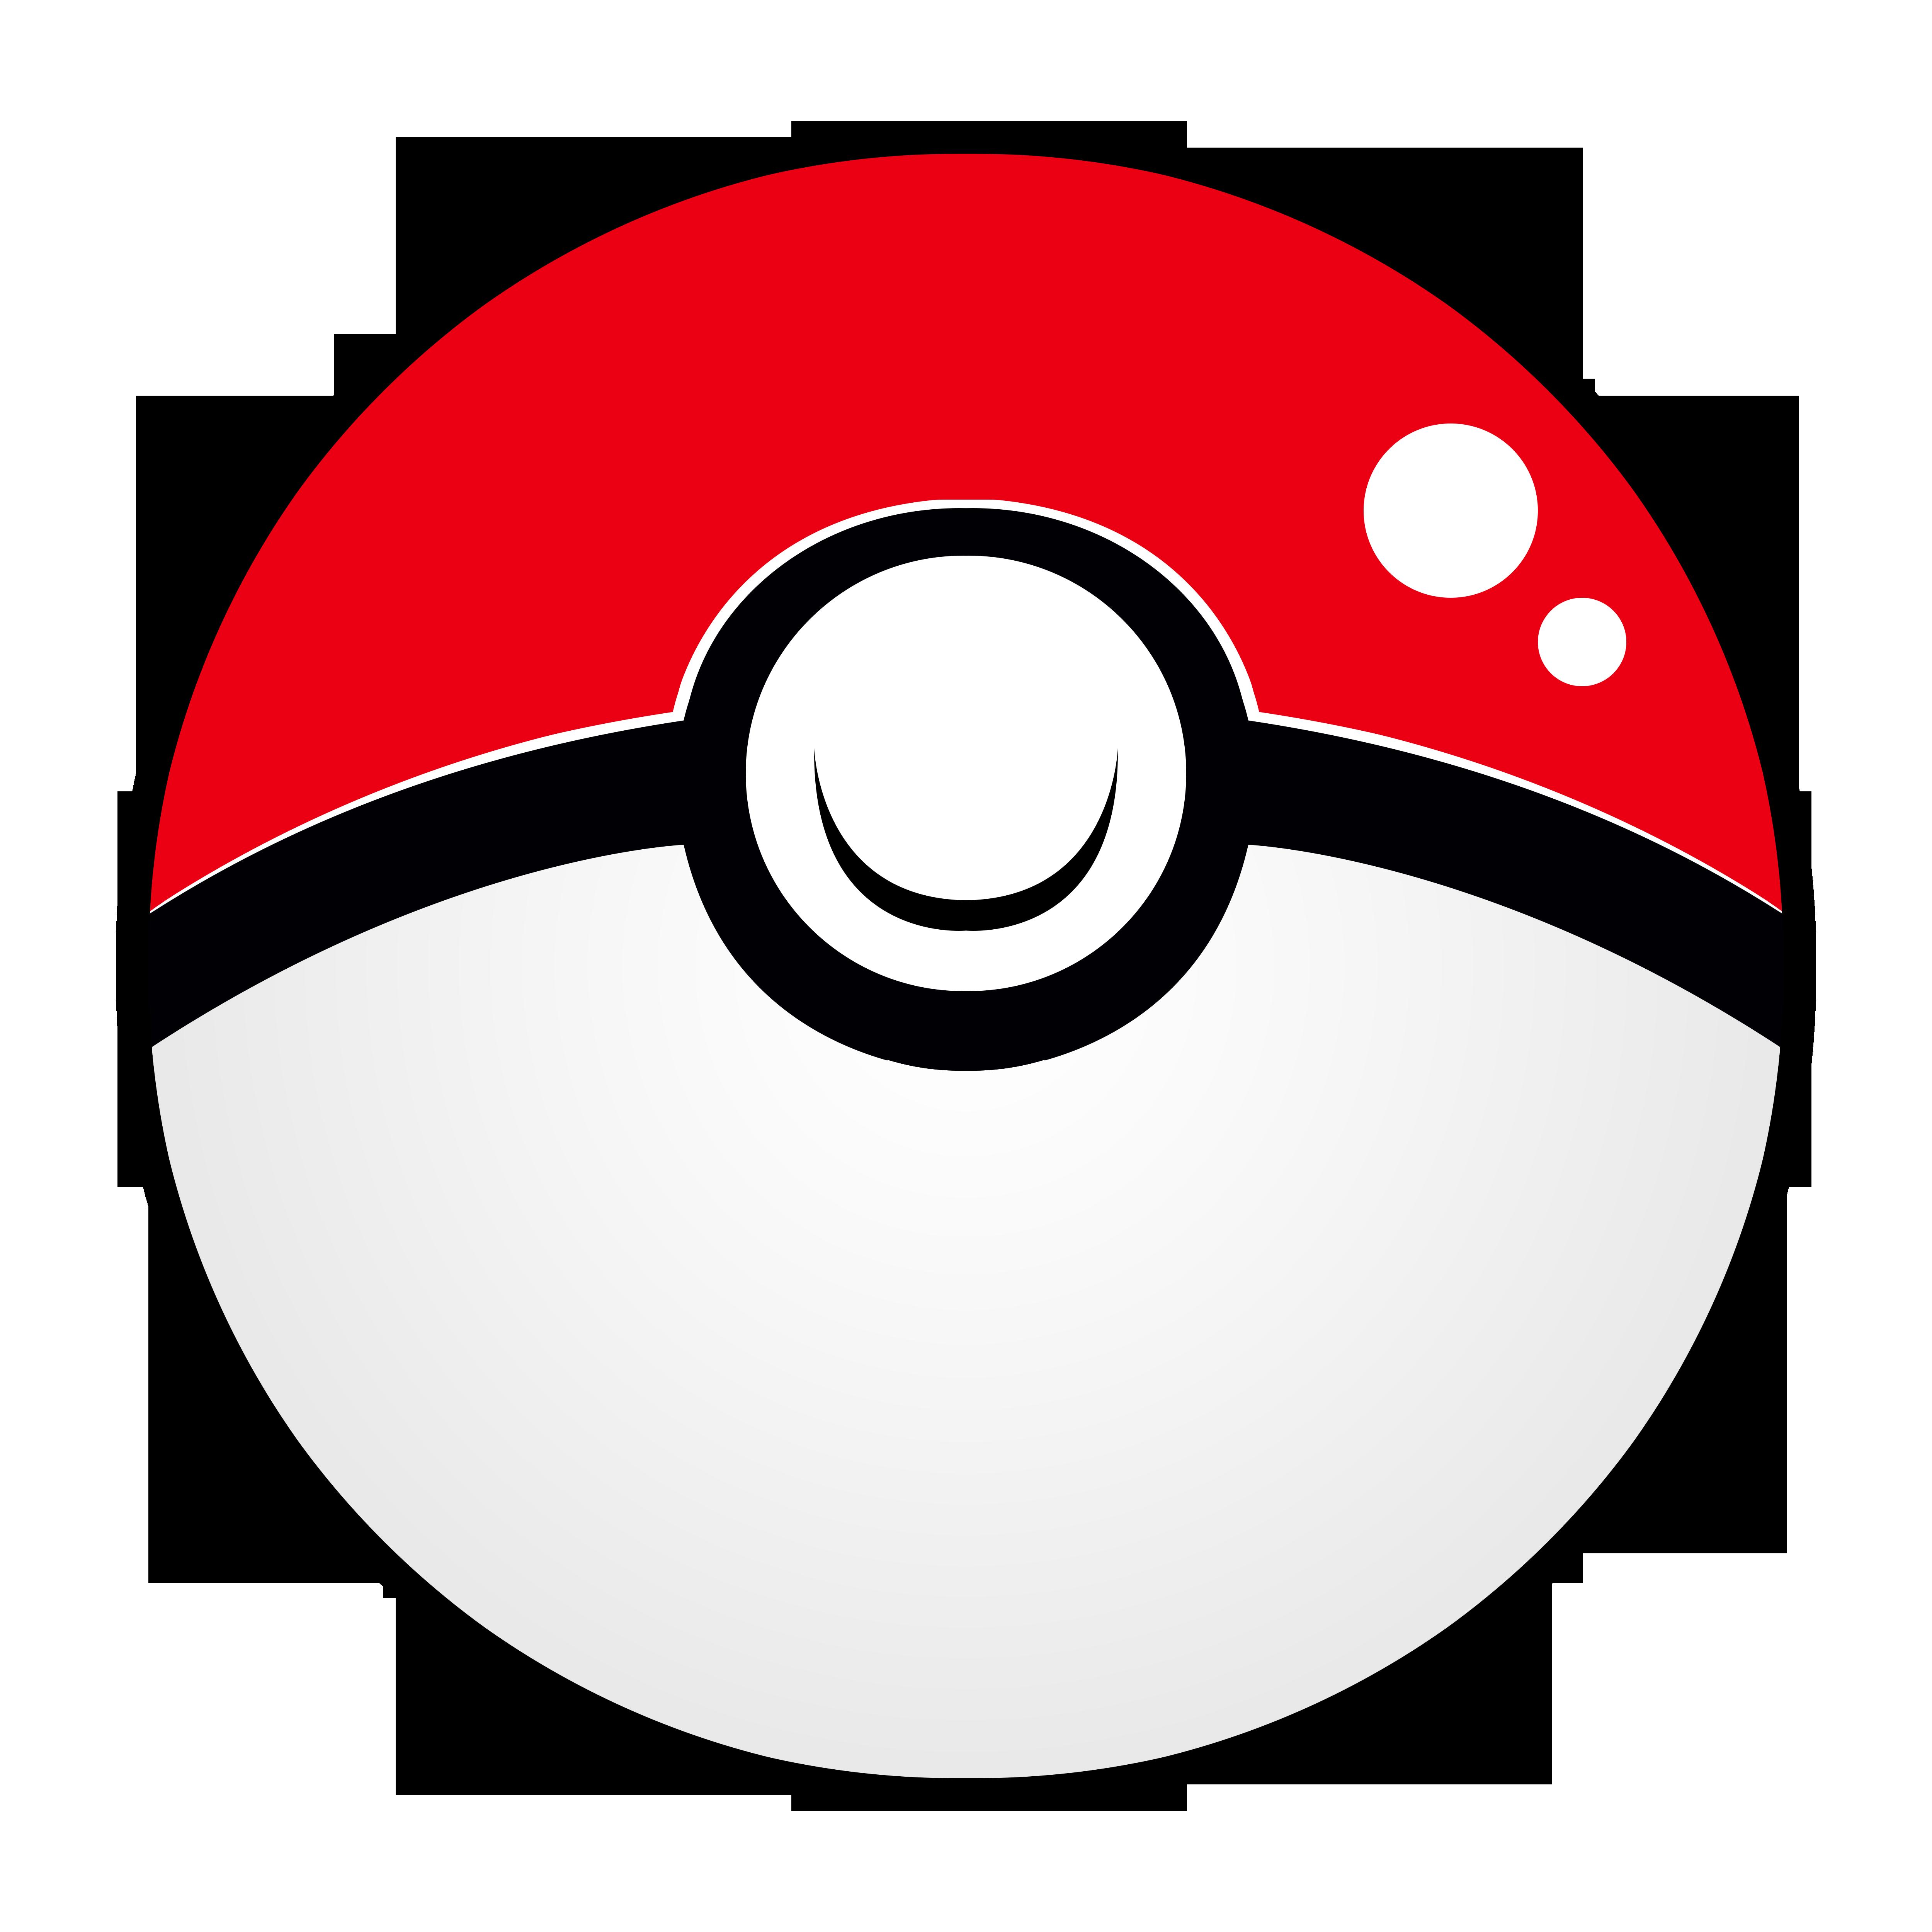 Pokeball, pokemon ball PNG images free download.